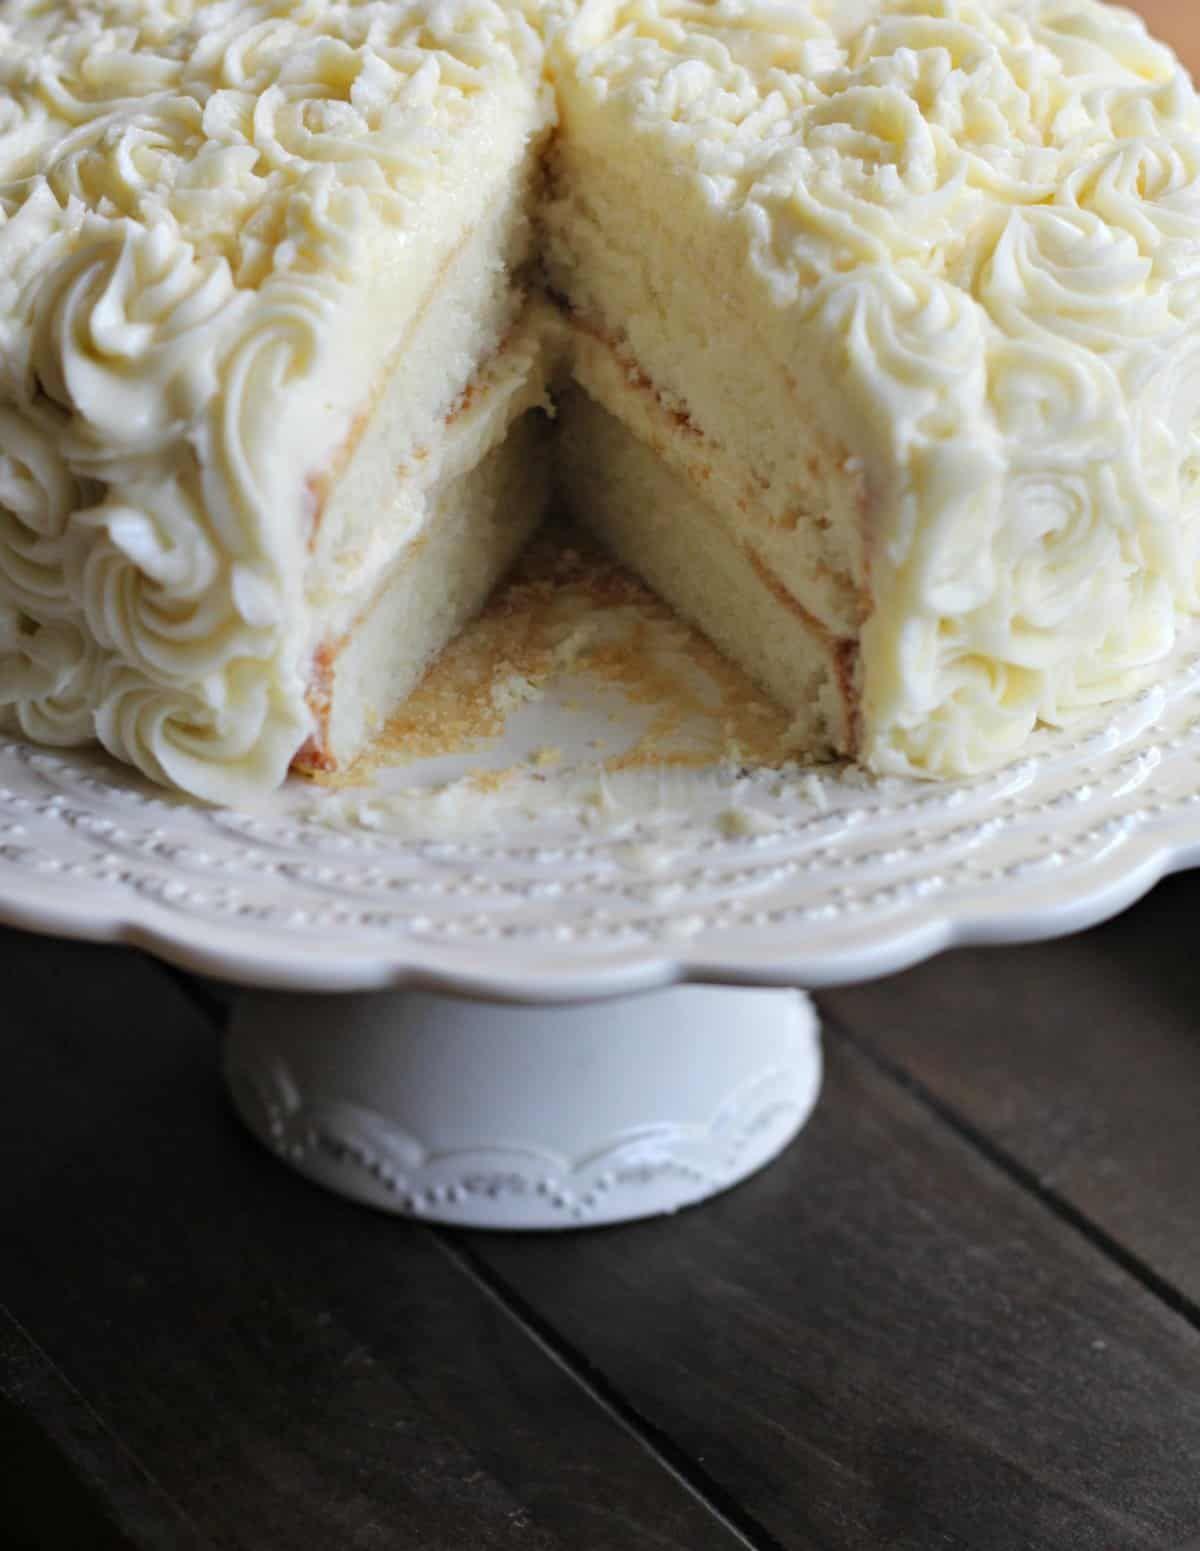 Awe Inspiring White Cake Recipe Cake Recipes Homemade White Cakes Cake Funny Birthday Cards Online Alyptdamsfinfo